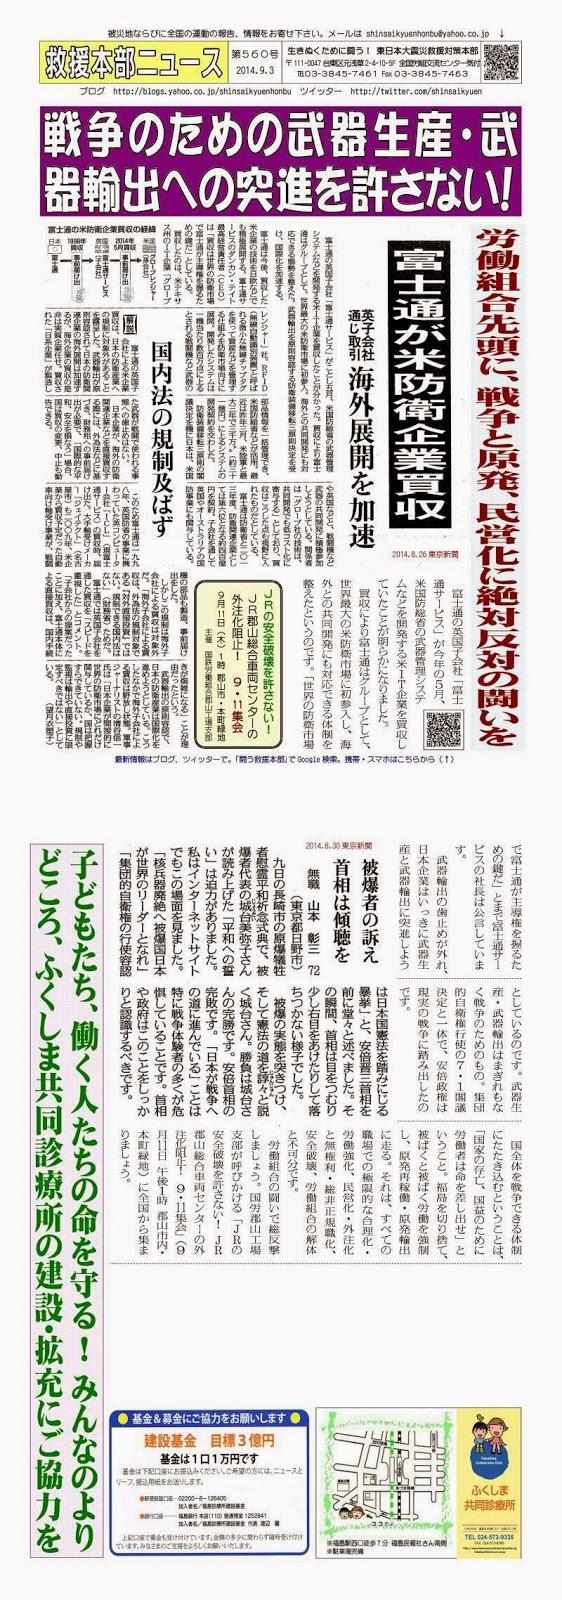 http://www.geocities.jp/shinsaikyuenhonbu/honbu560.pdf